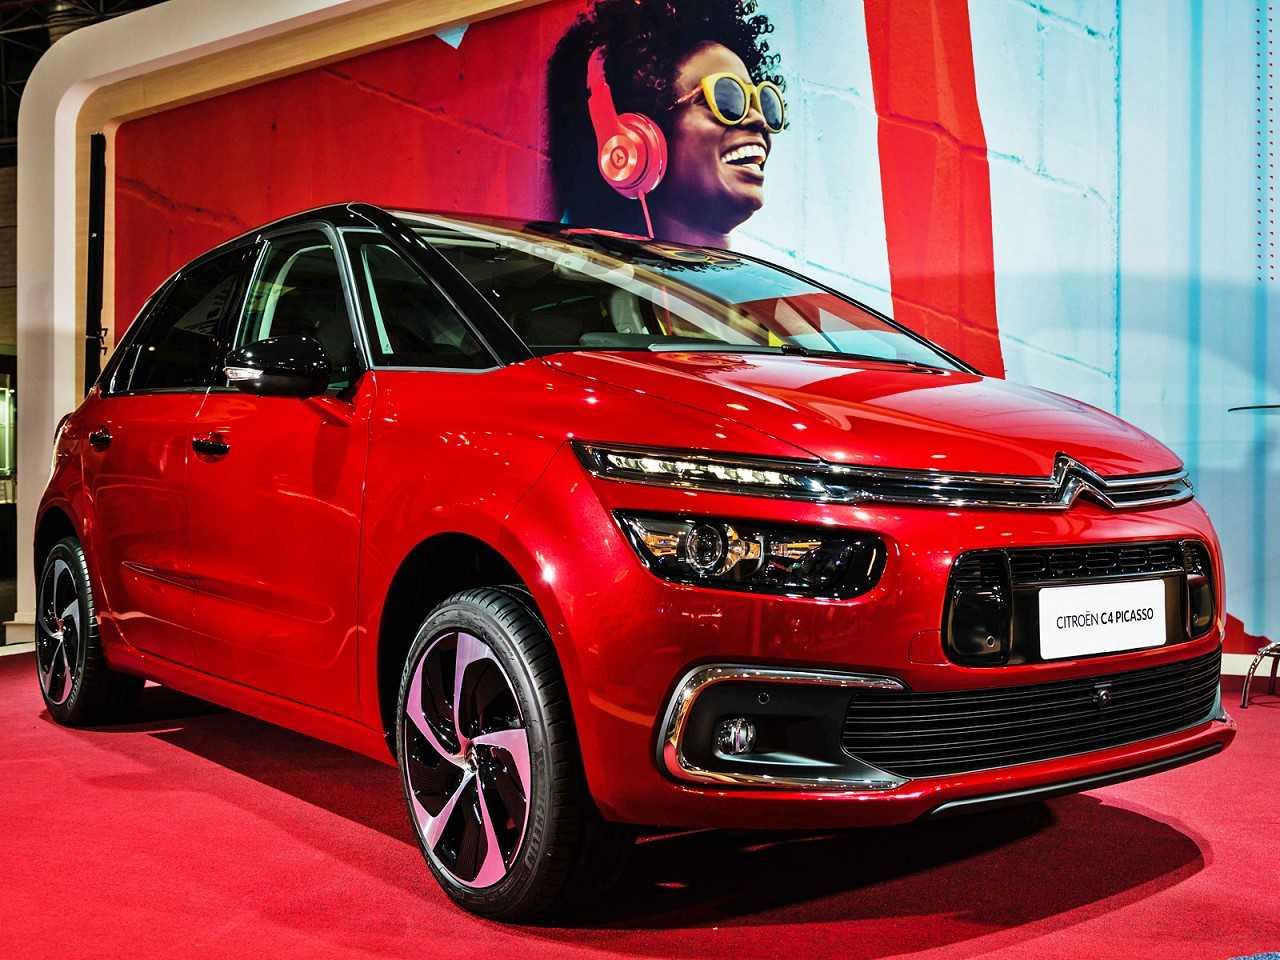 CitroënC4 Picasso 2017 - ângulo frontal